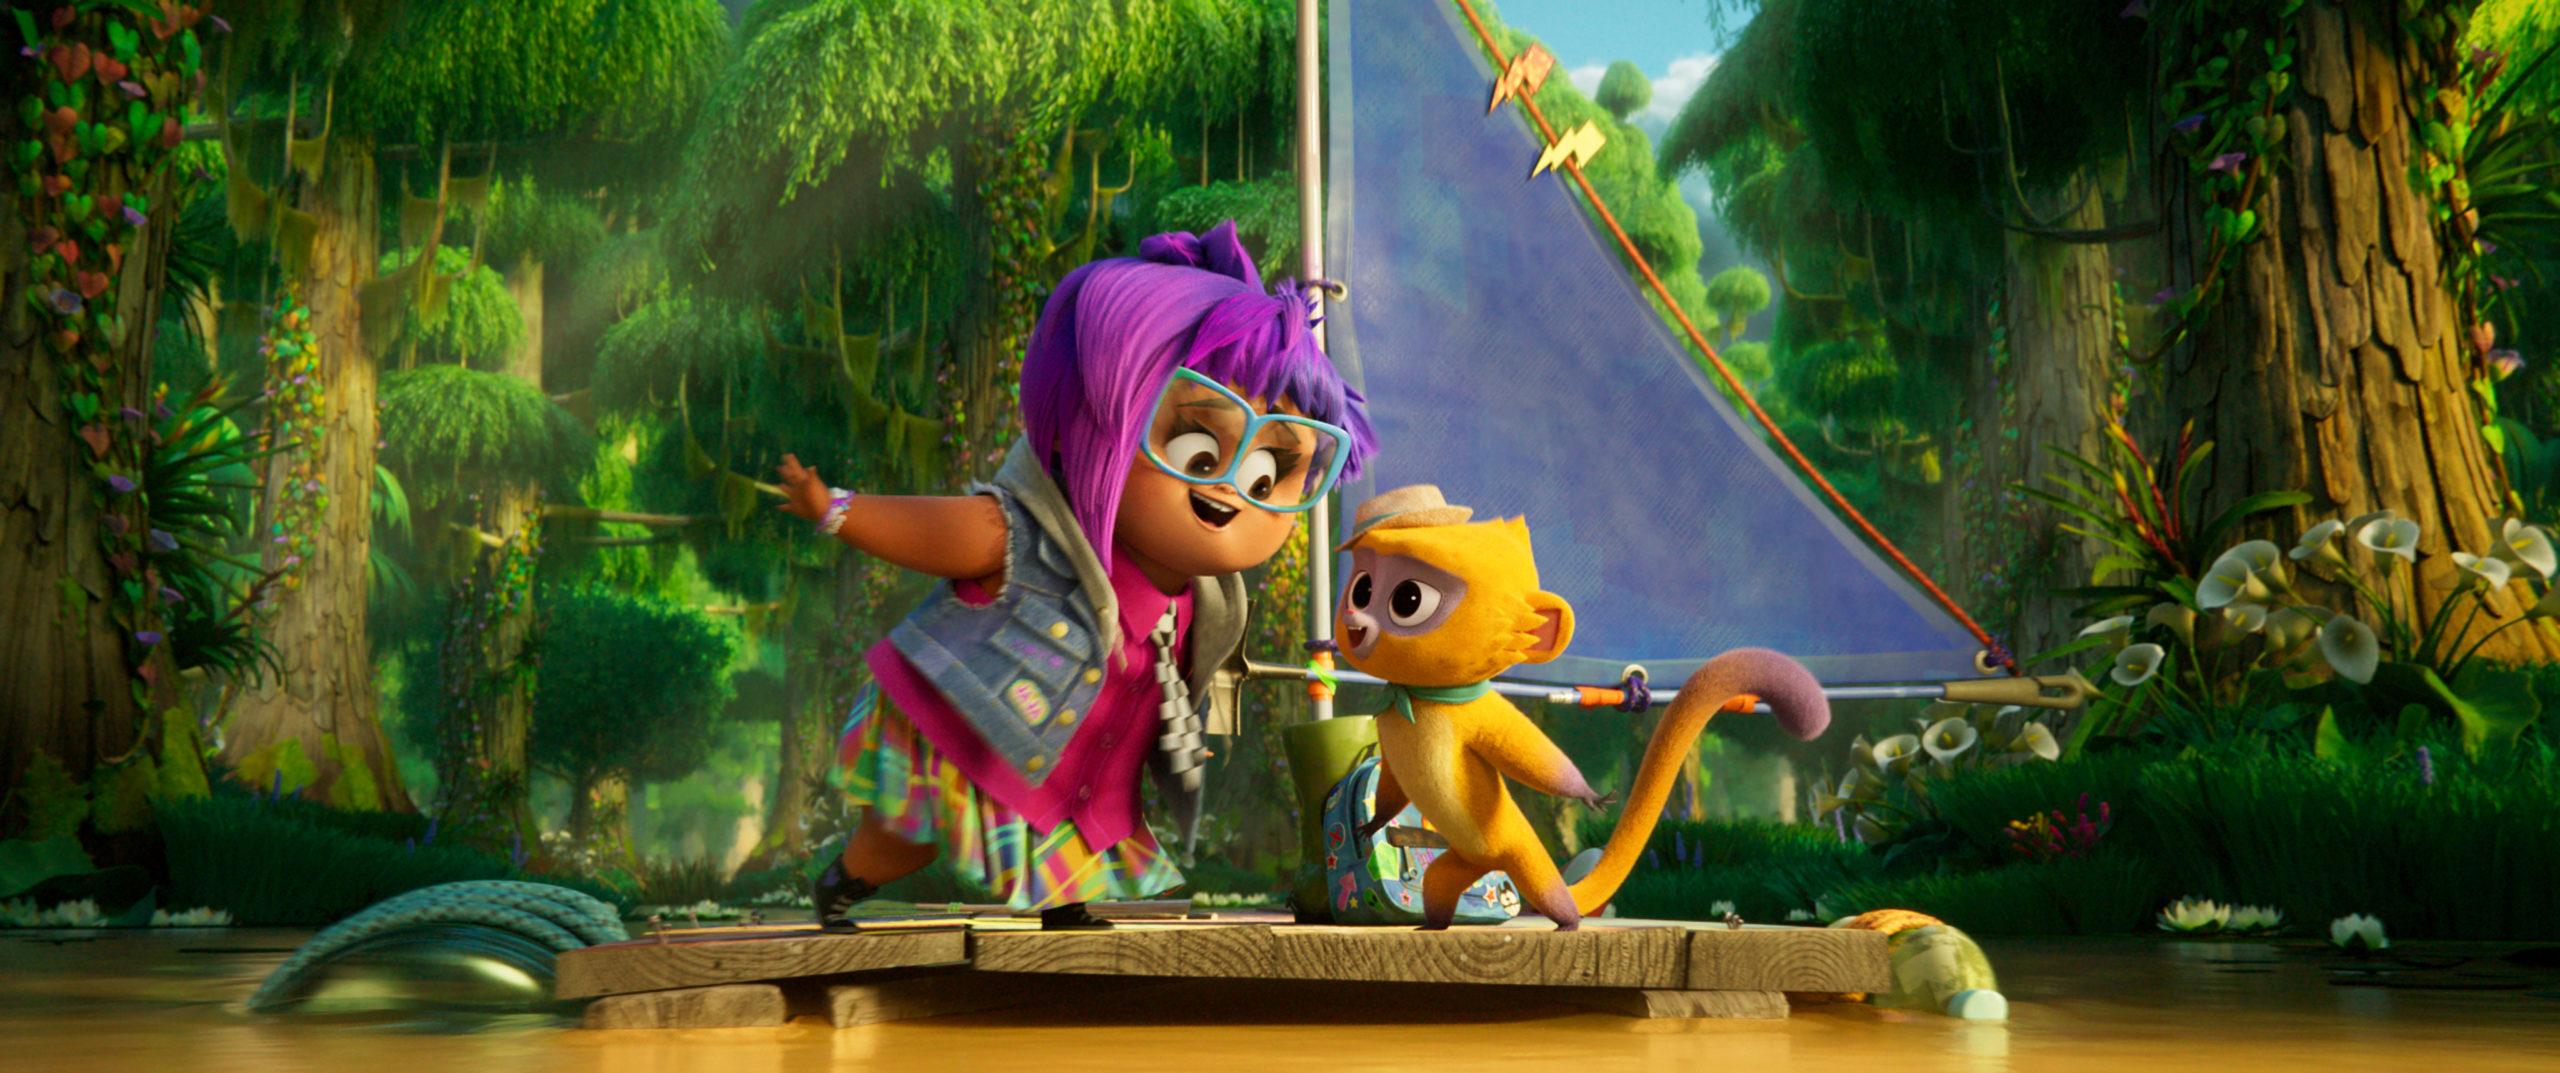 CG girl with purple hair and a kinkajou.